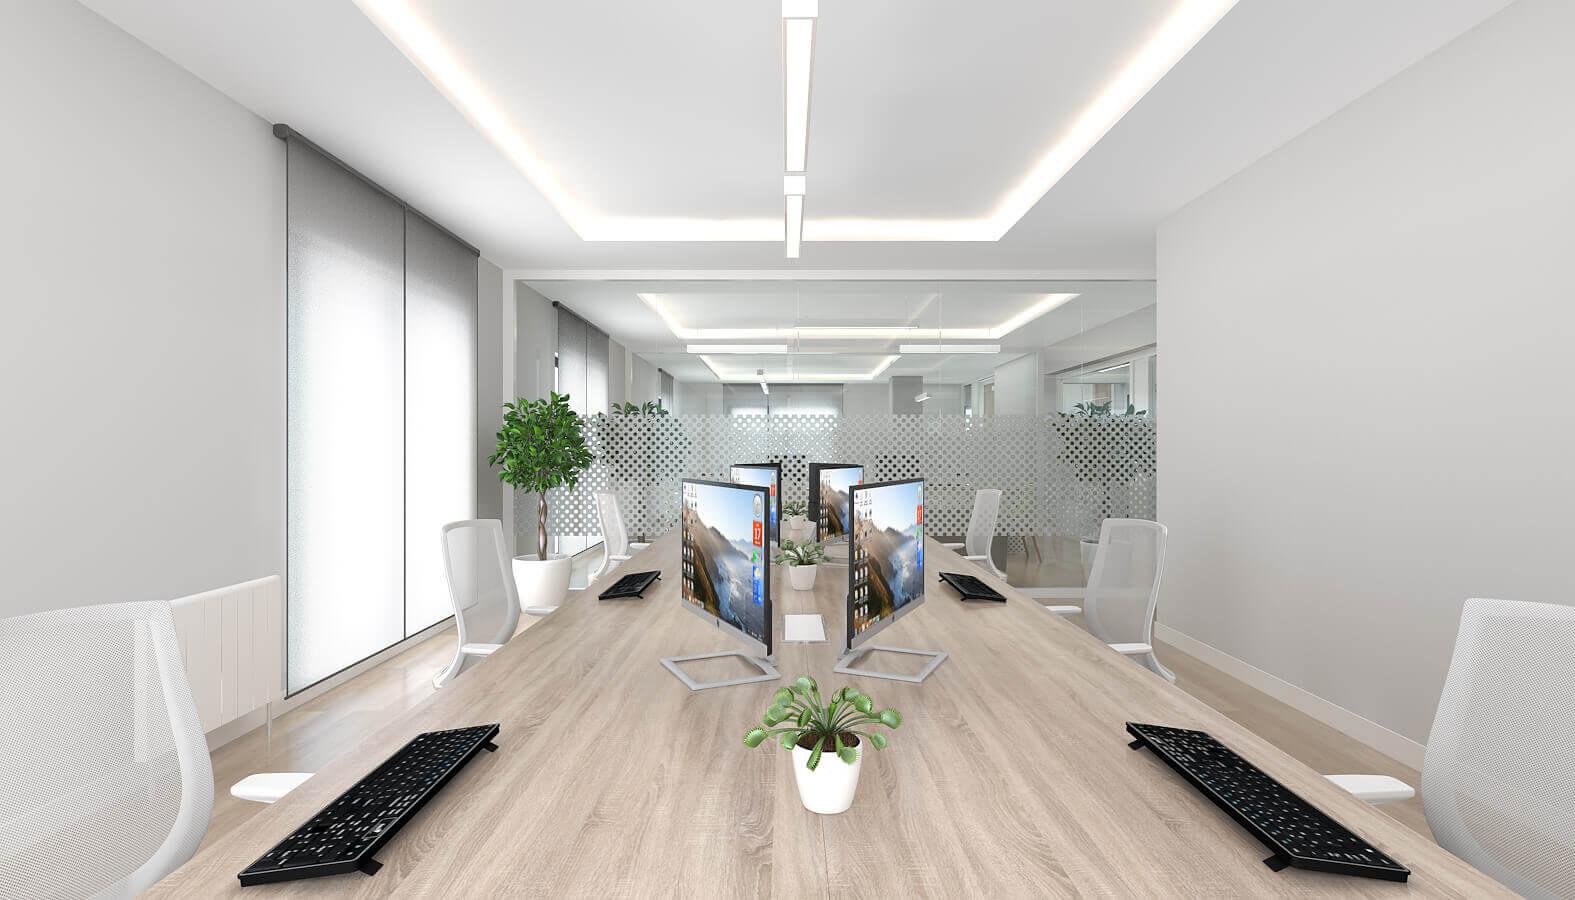 office design 3795 Telsam Telekom Offices